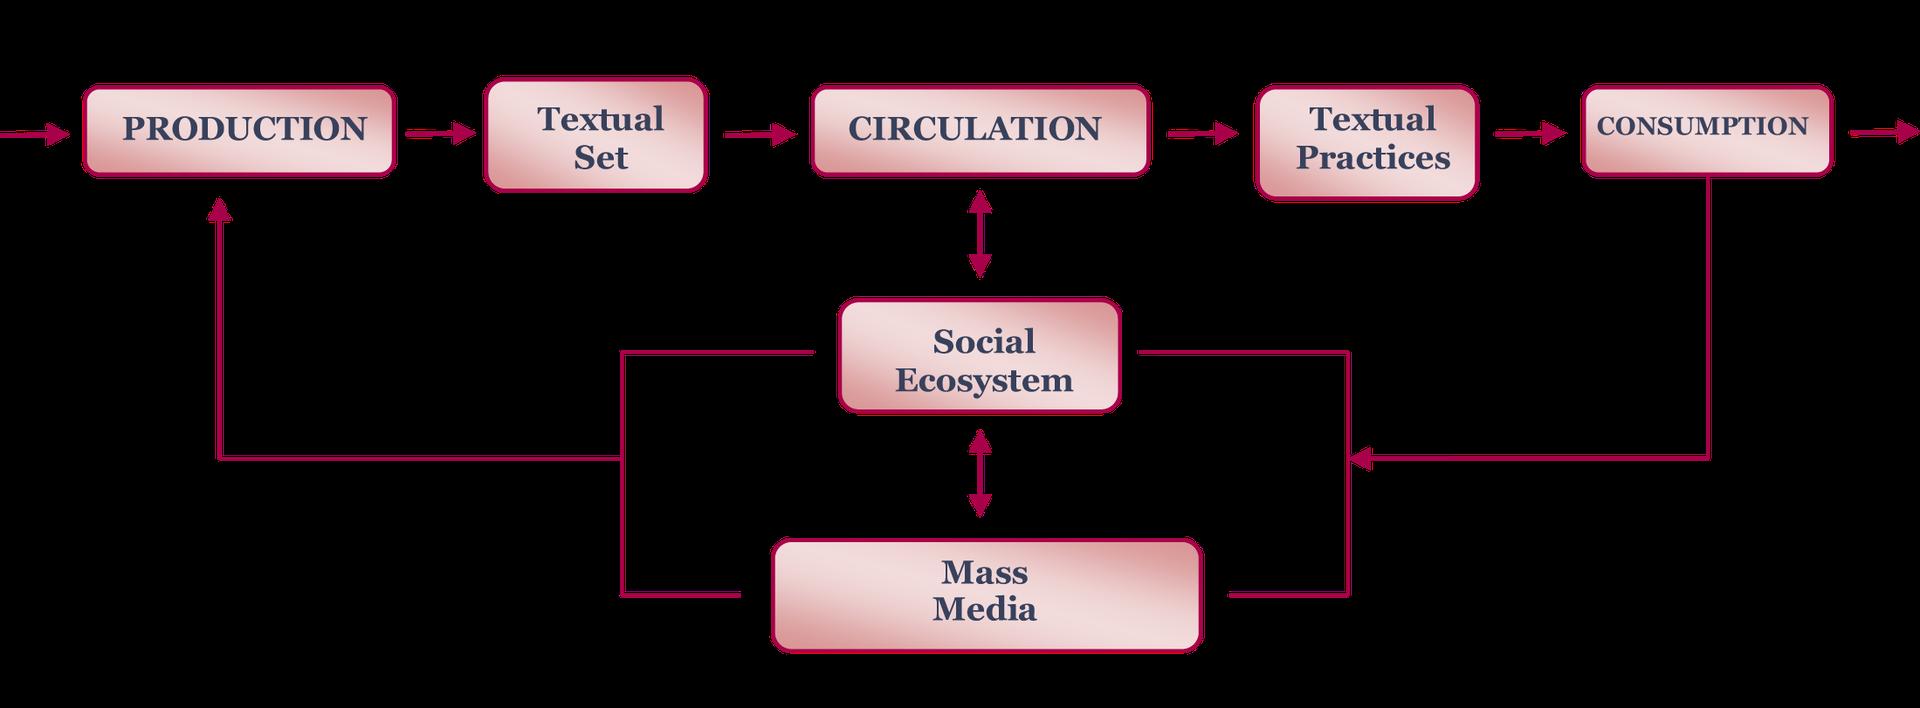 Semiotic Textual Model Comunicólogos